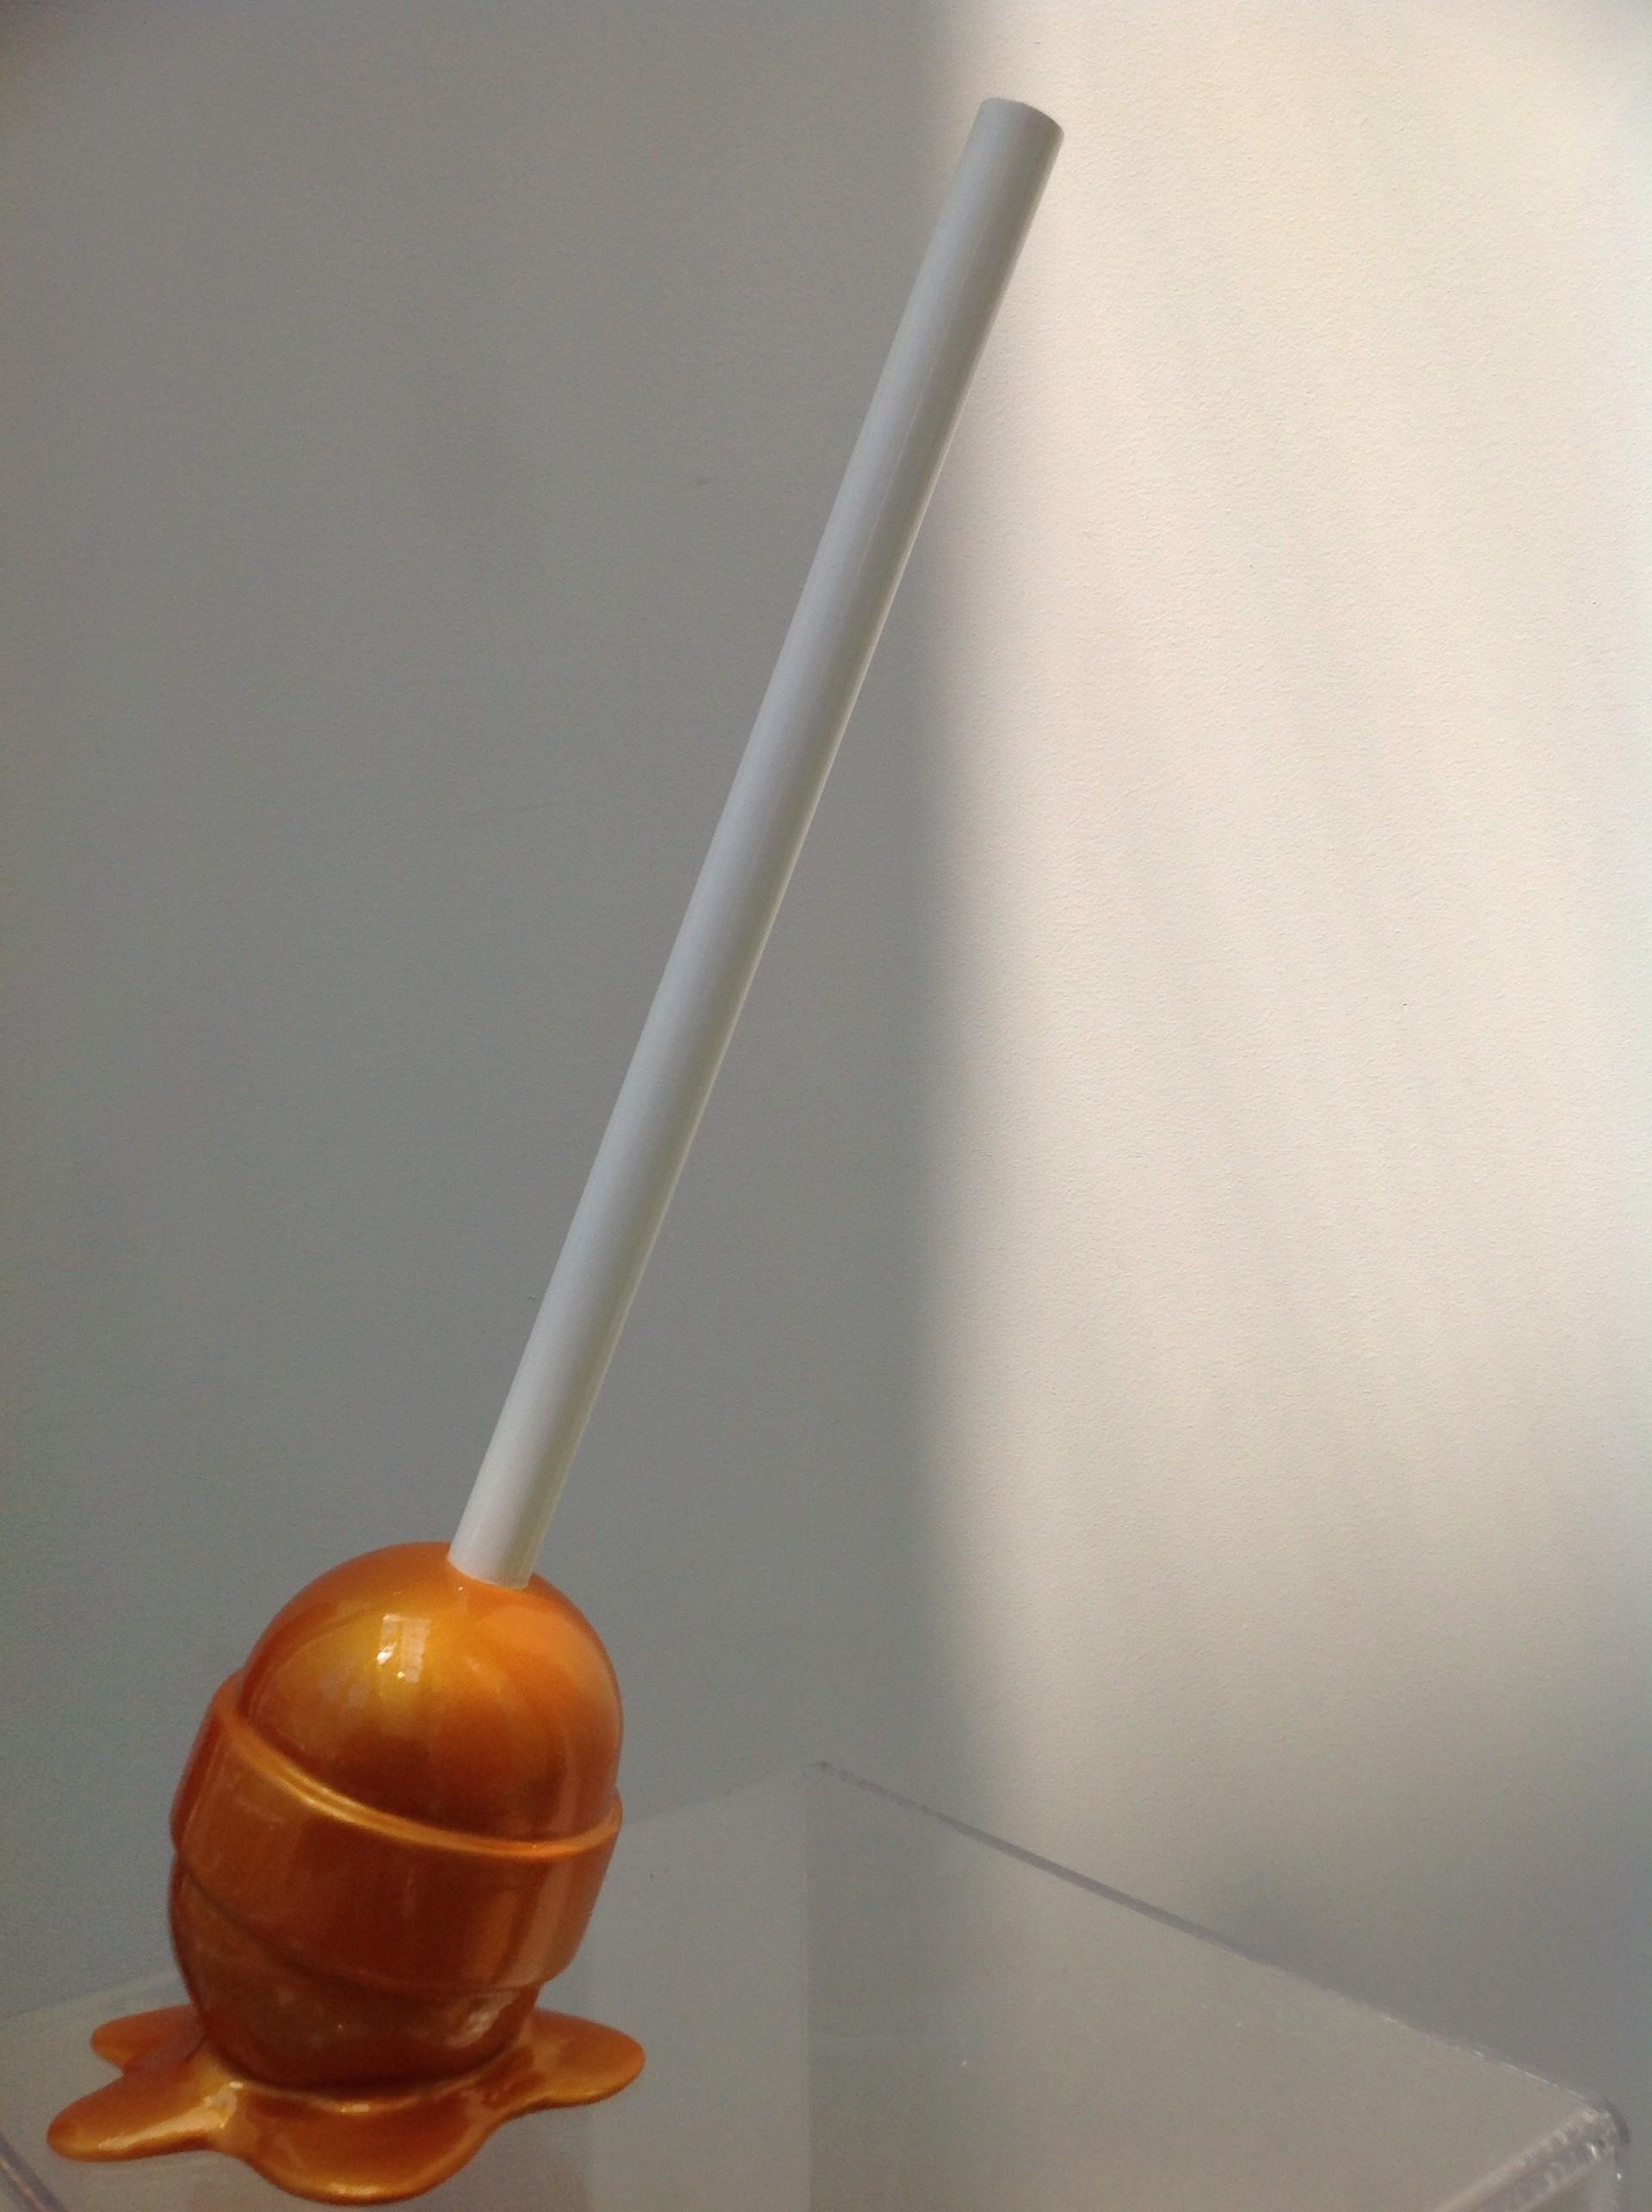 The Sweet Life Small Gold Lollipop by Elena Bulatova